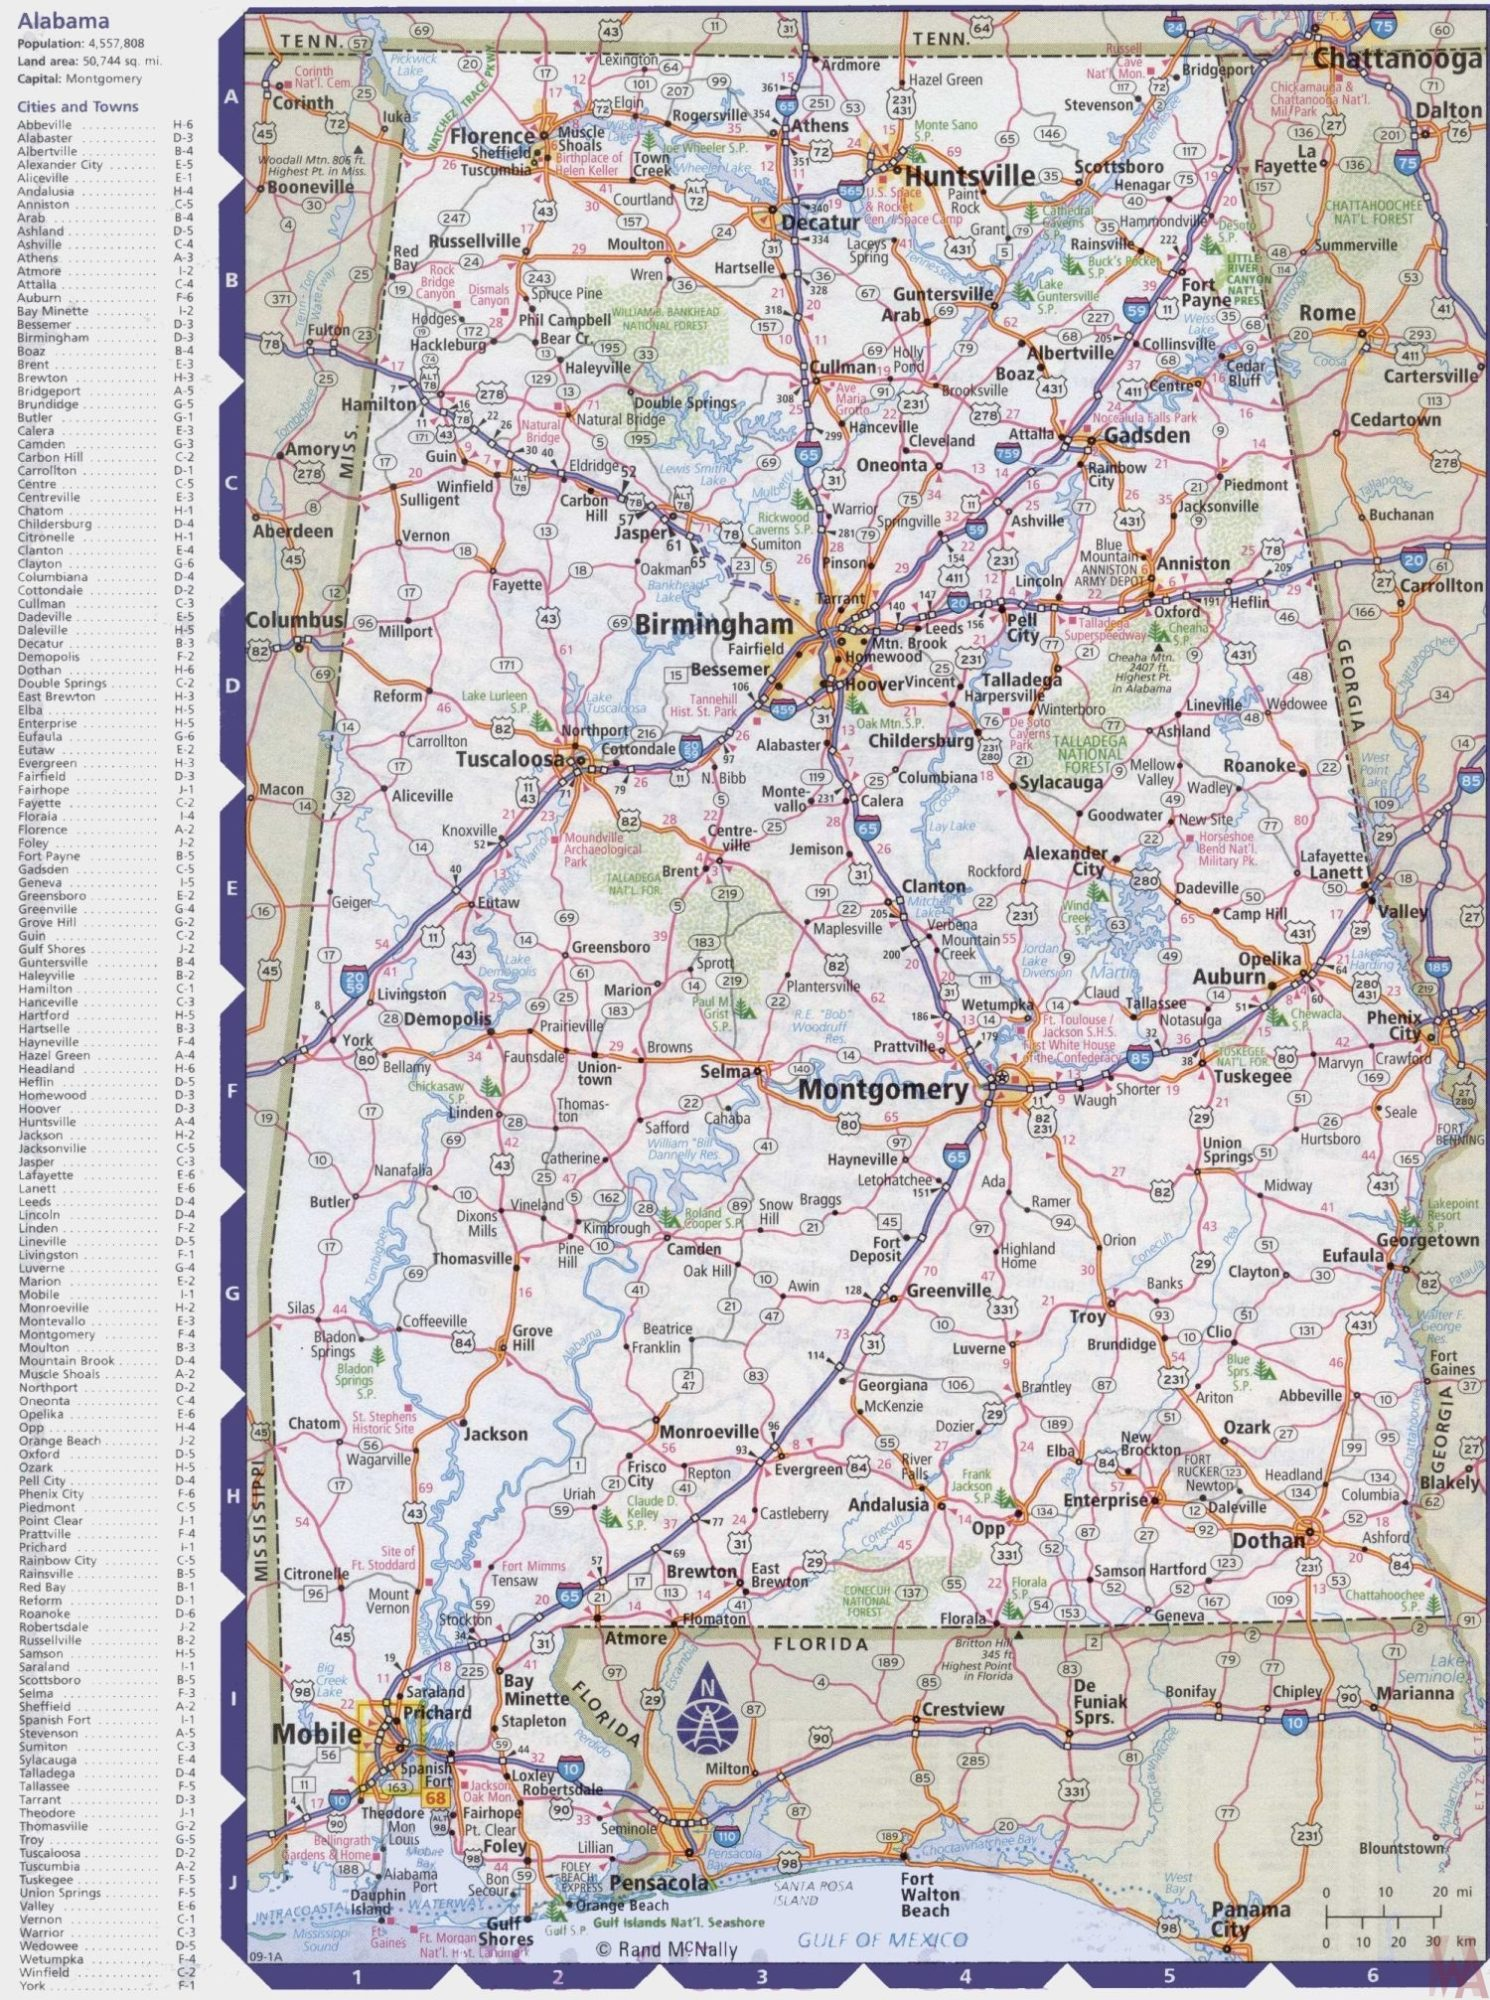 Political Map Of Alabama.Alabama Large Political Map Political Map Of Alabama With Capital